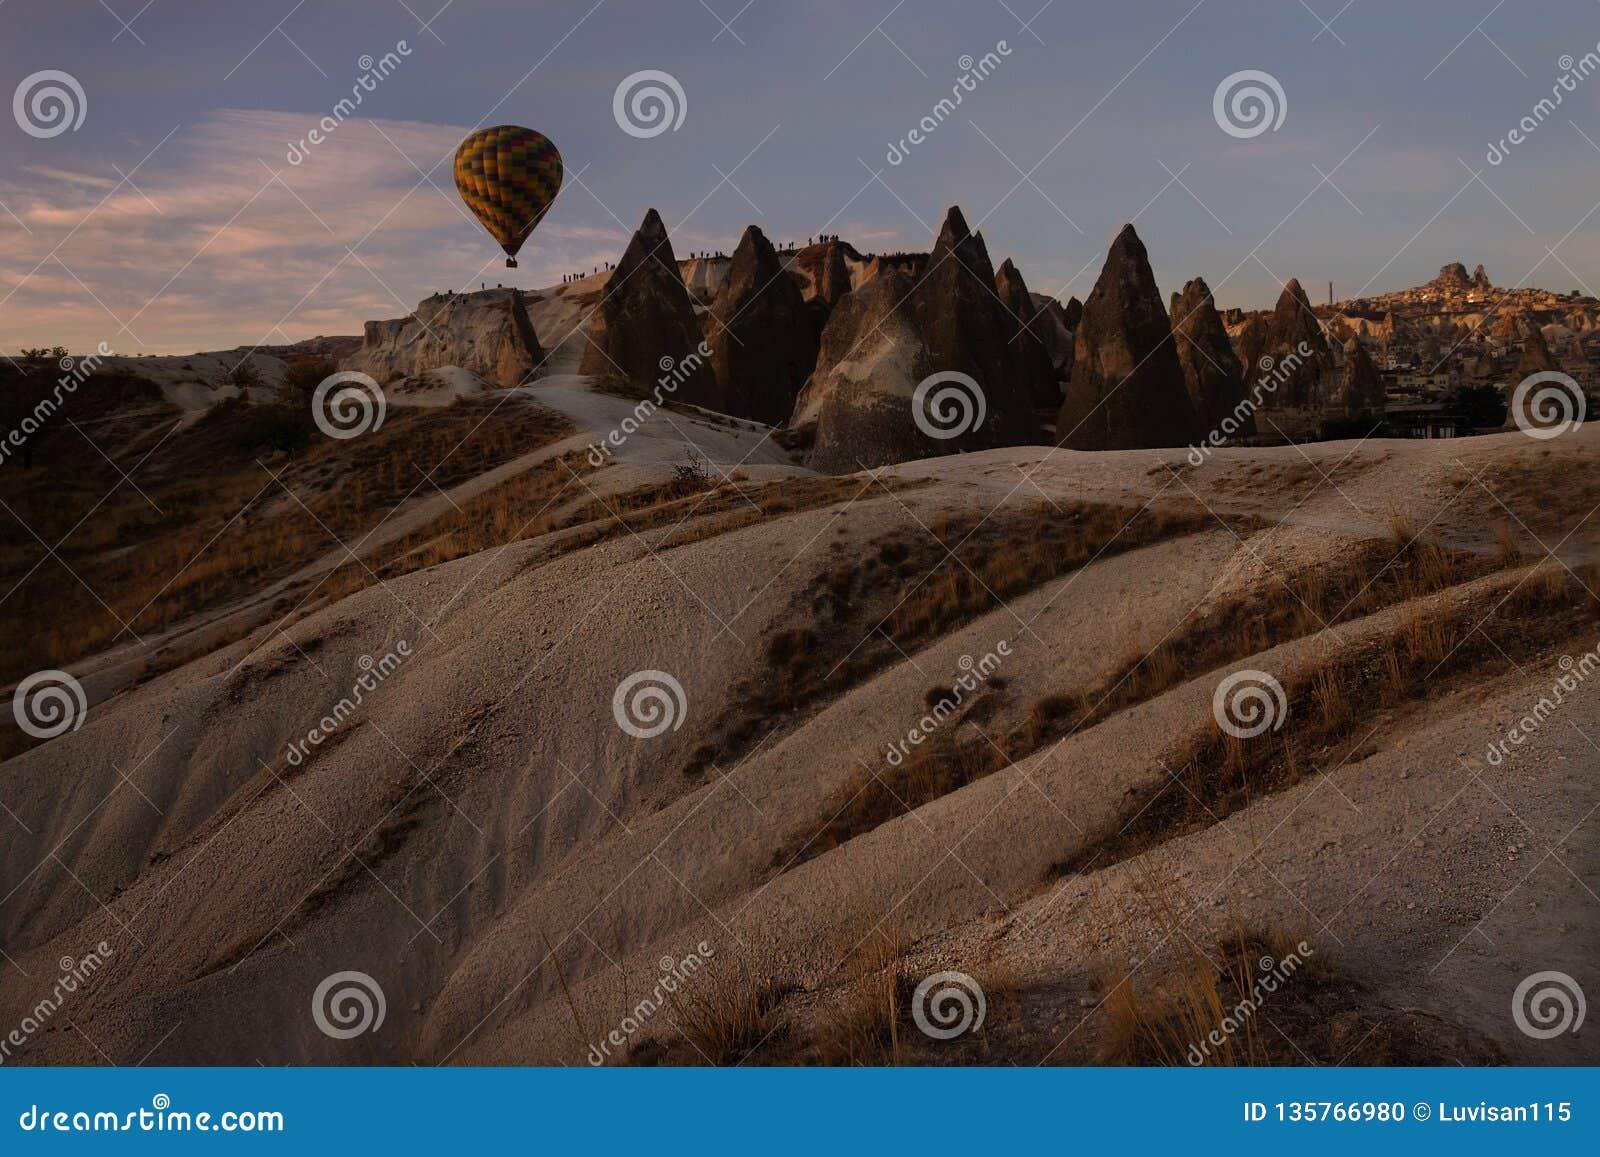 Vol chaud de ballon à air, Goreme, Cappadocia, Turquie